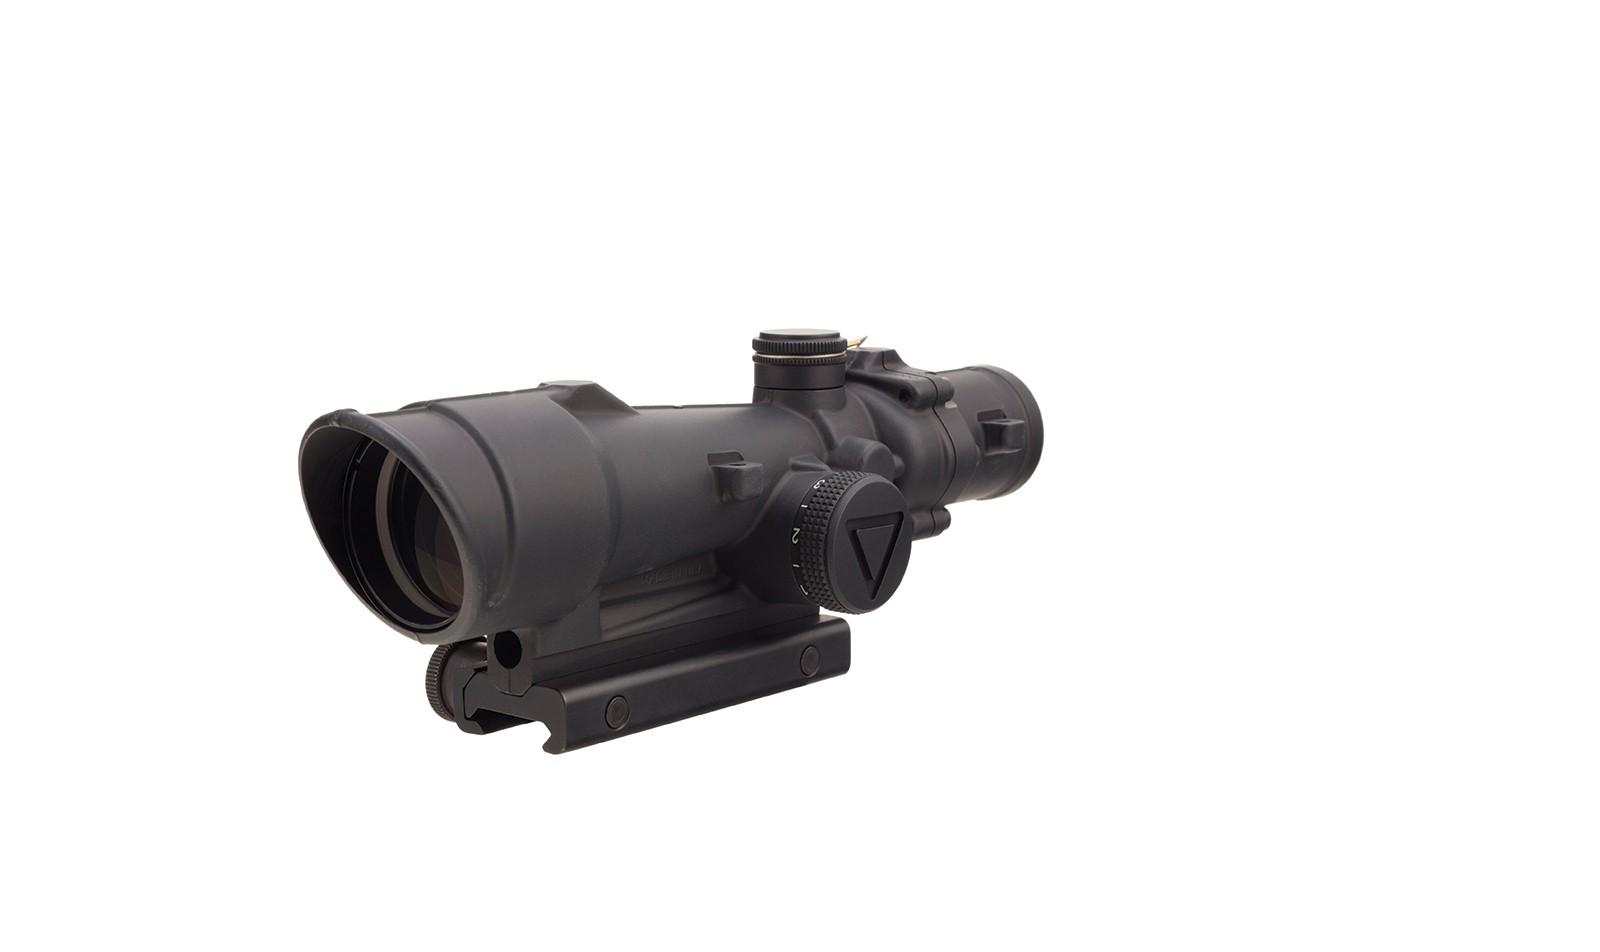 Trijicon ACOG<sup>®</sup> 3.5x35 LED Riflescope -.308 / 7.62 BDC